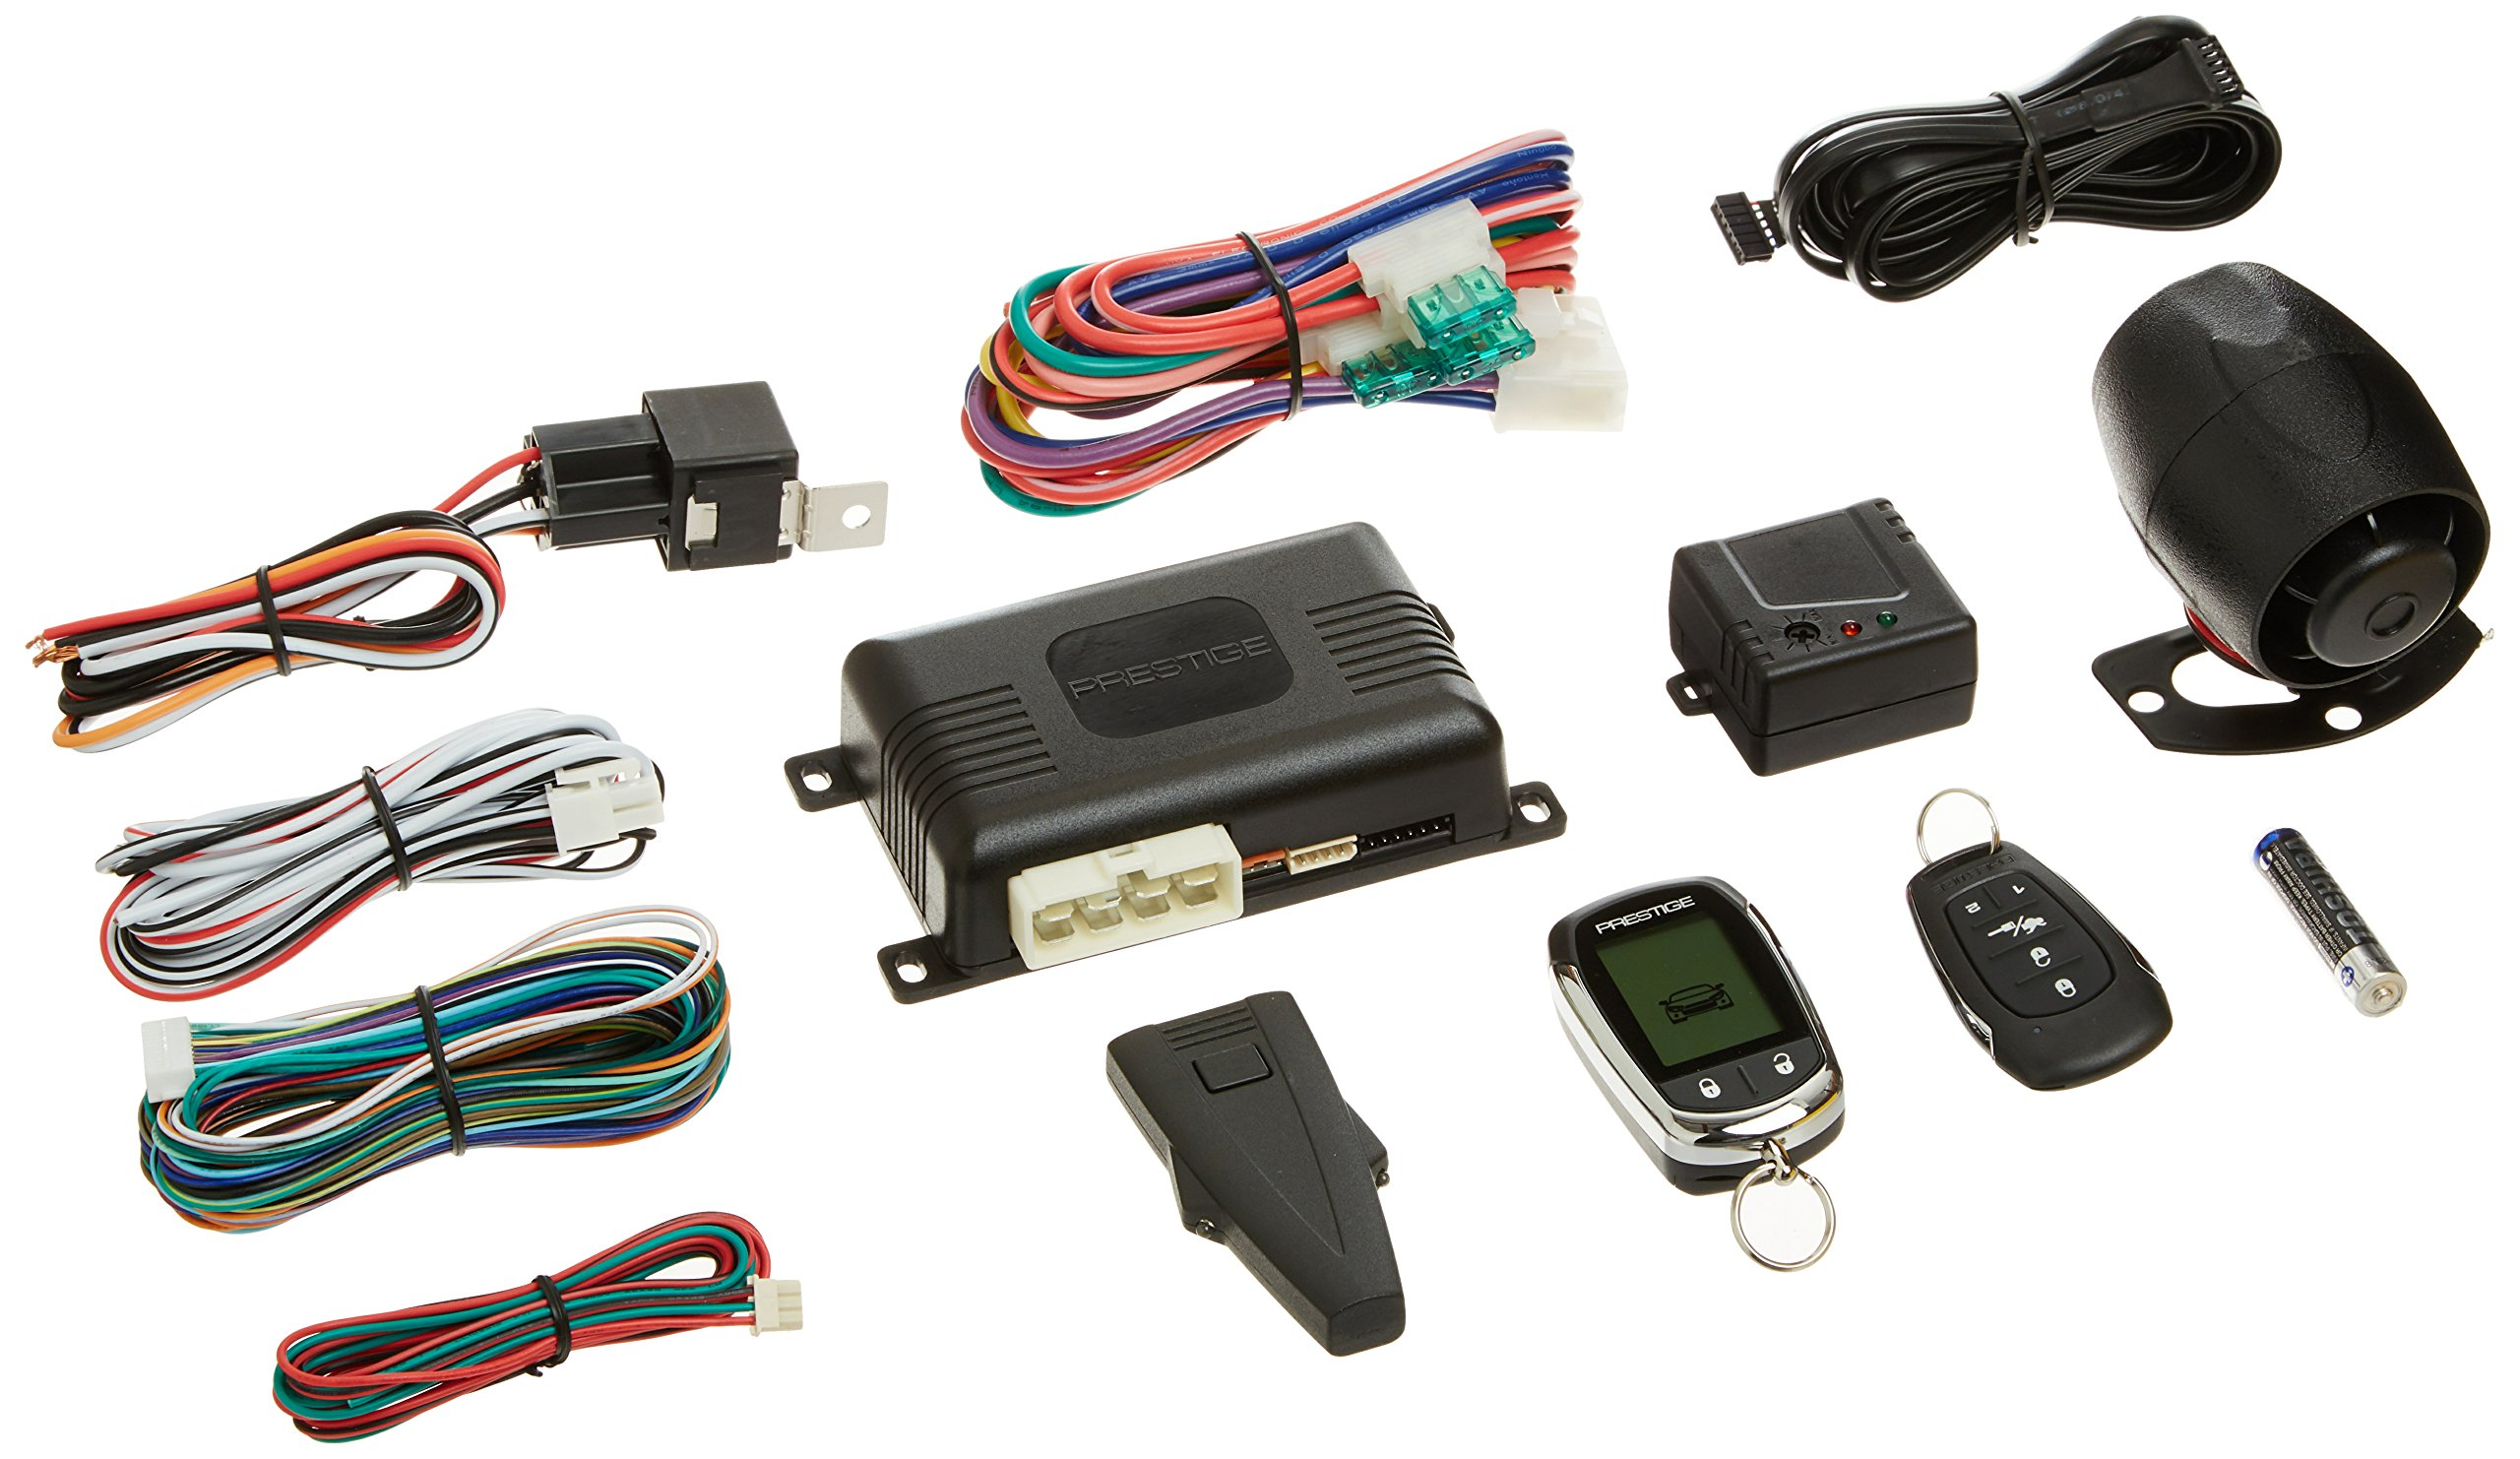 New Prestige APS997E 2-Way LCD Remote Start & Car Alarm System Replaces APS997C by Prestige